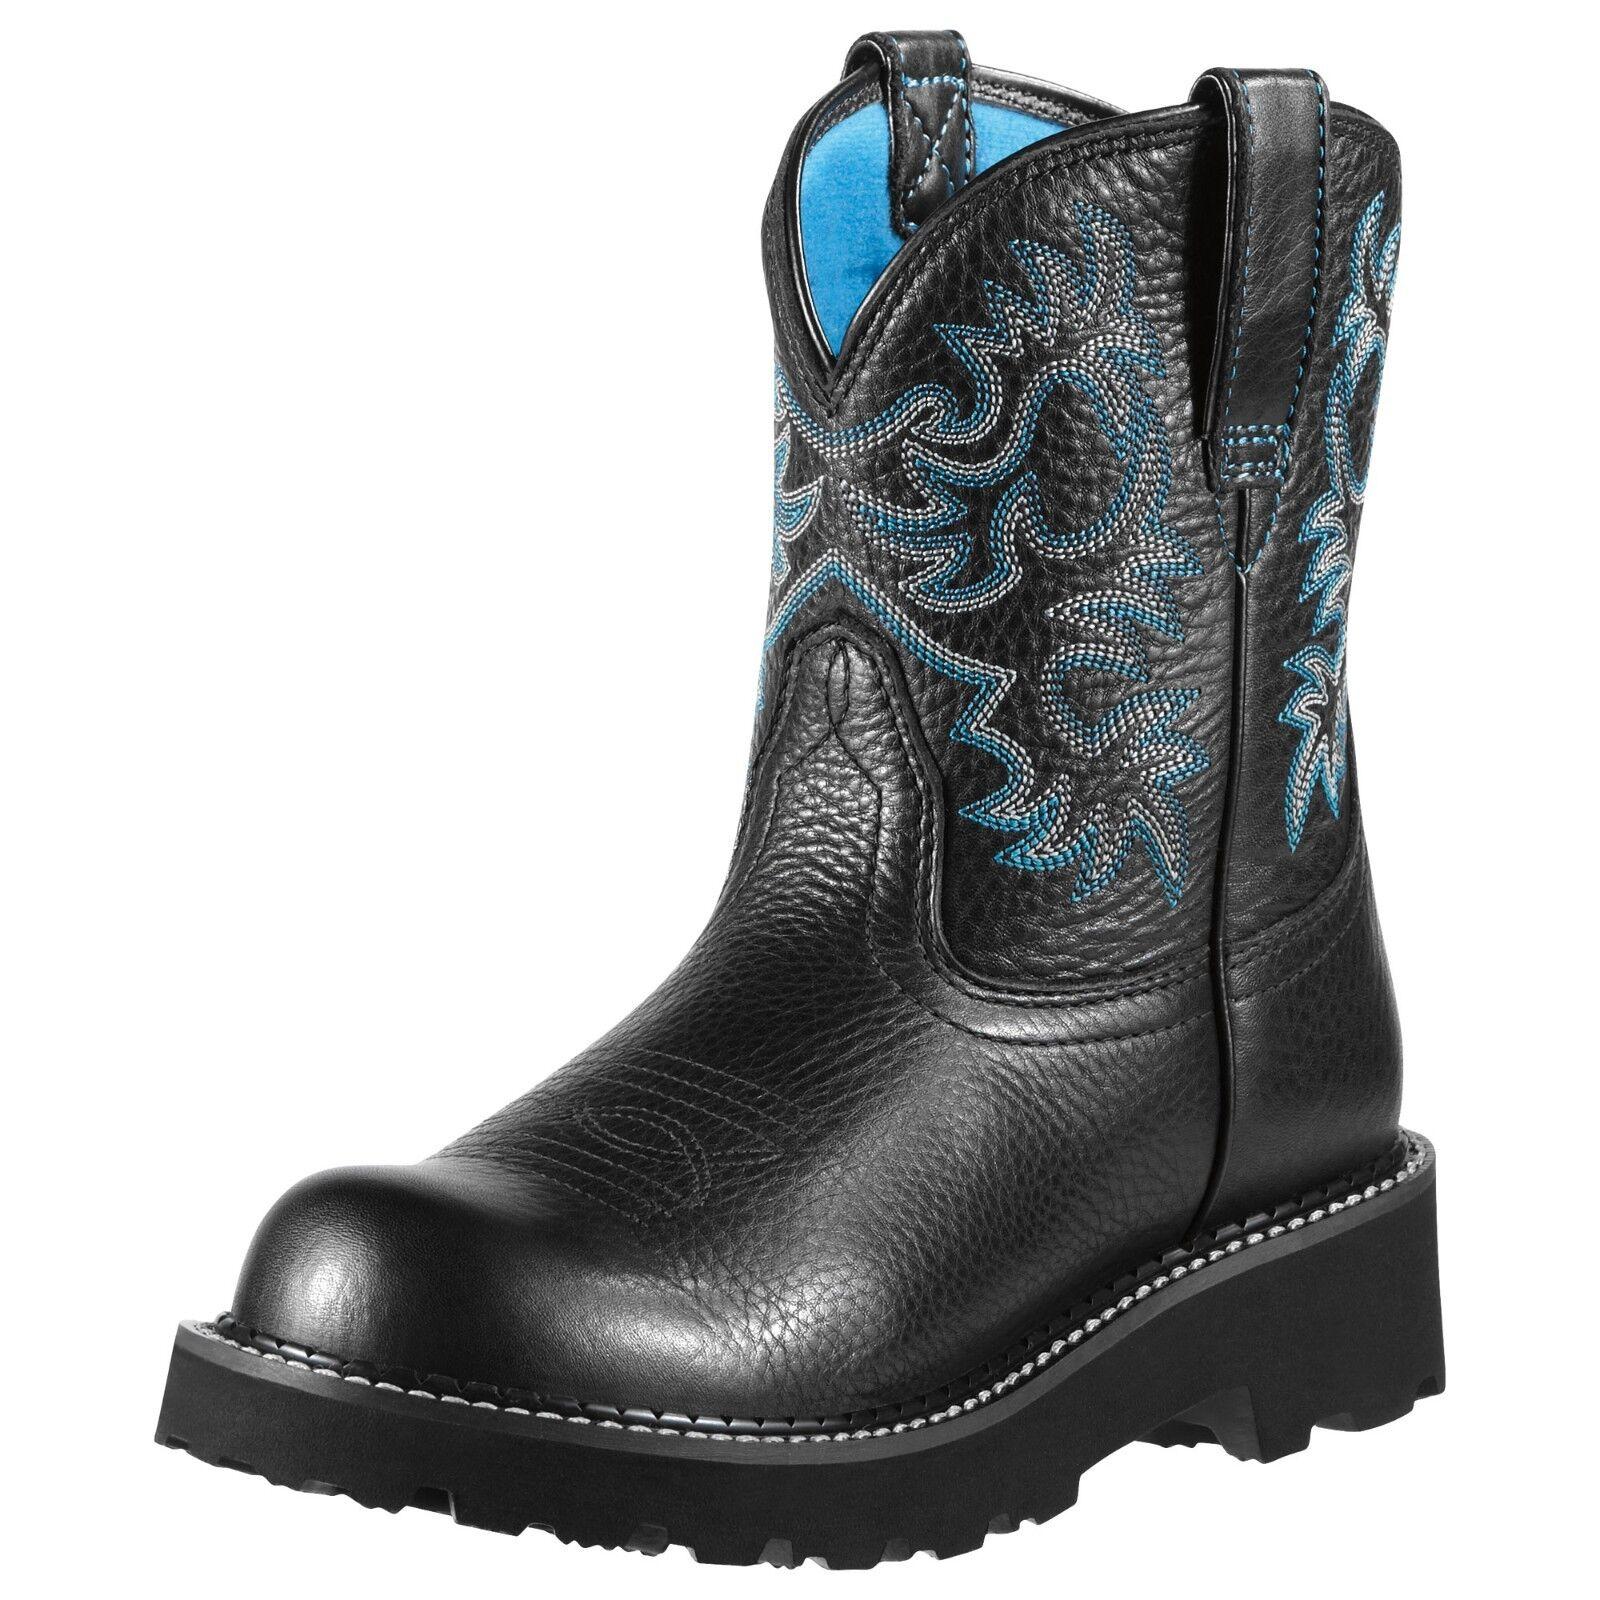 Ariat Womens Fatbaby Black Deertan Blue Liner 10000833 (New Style)